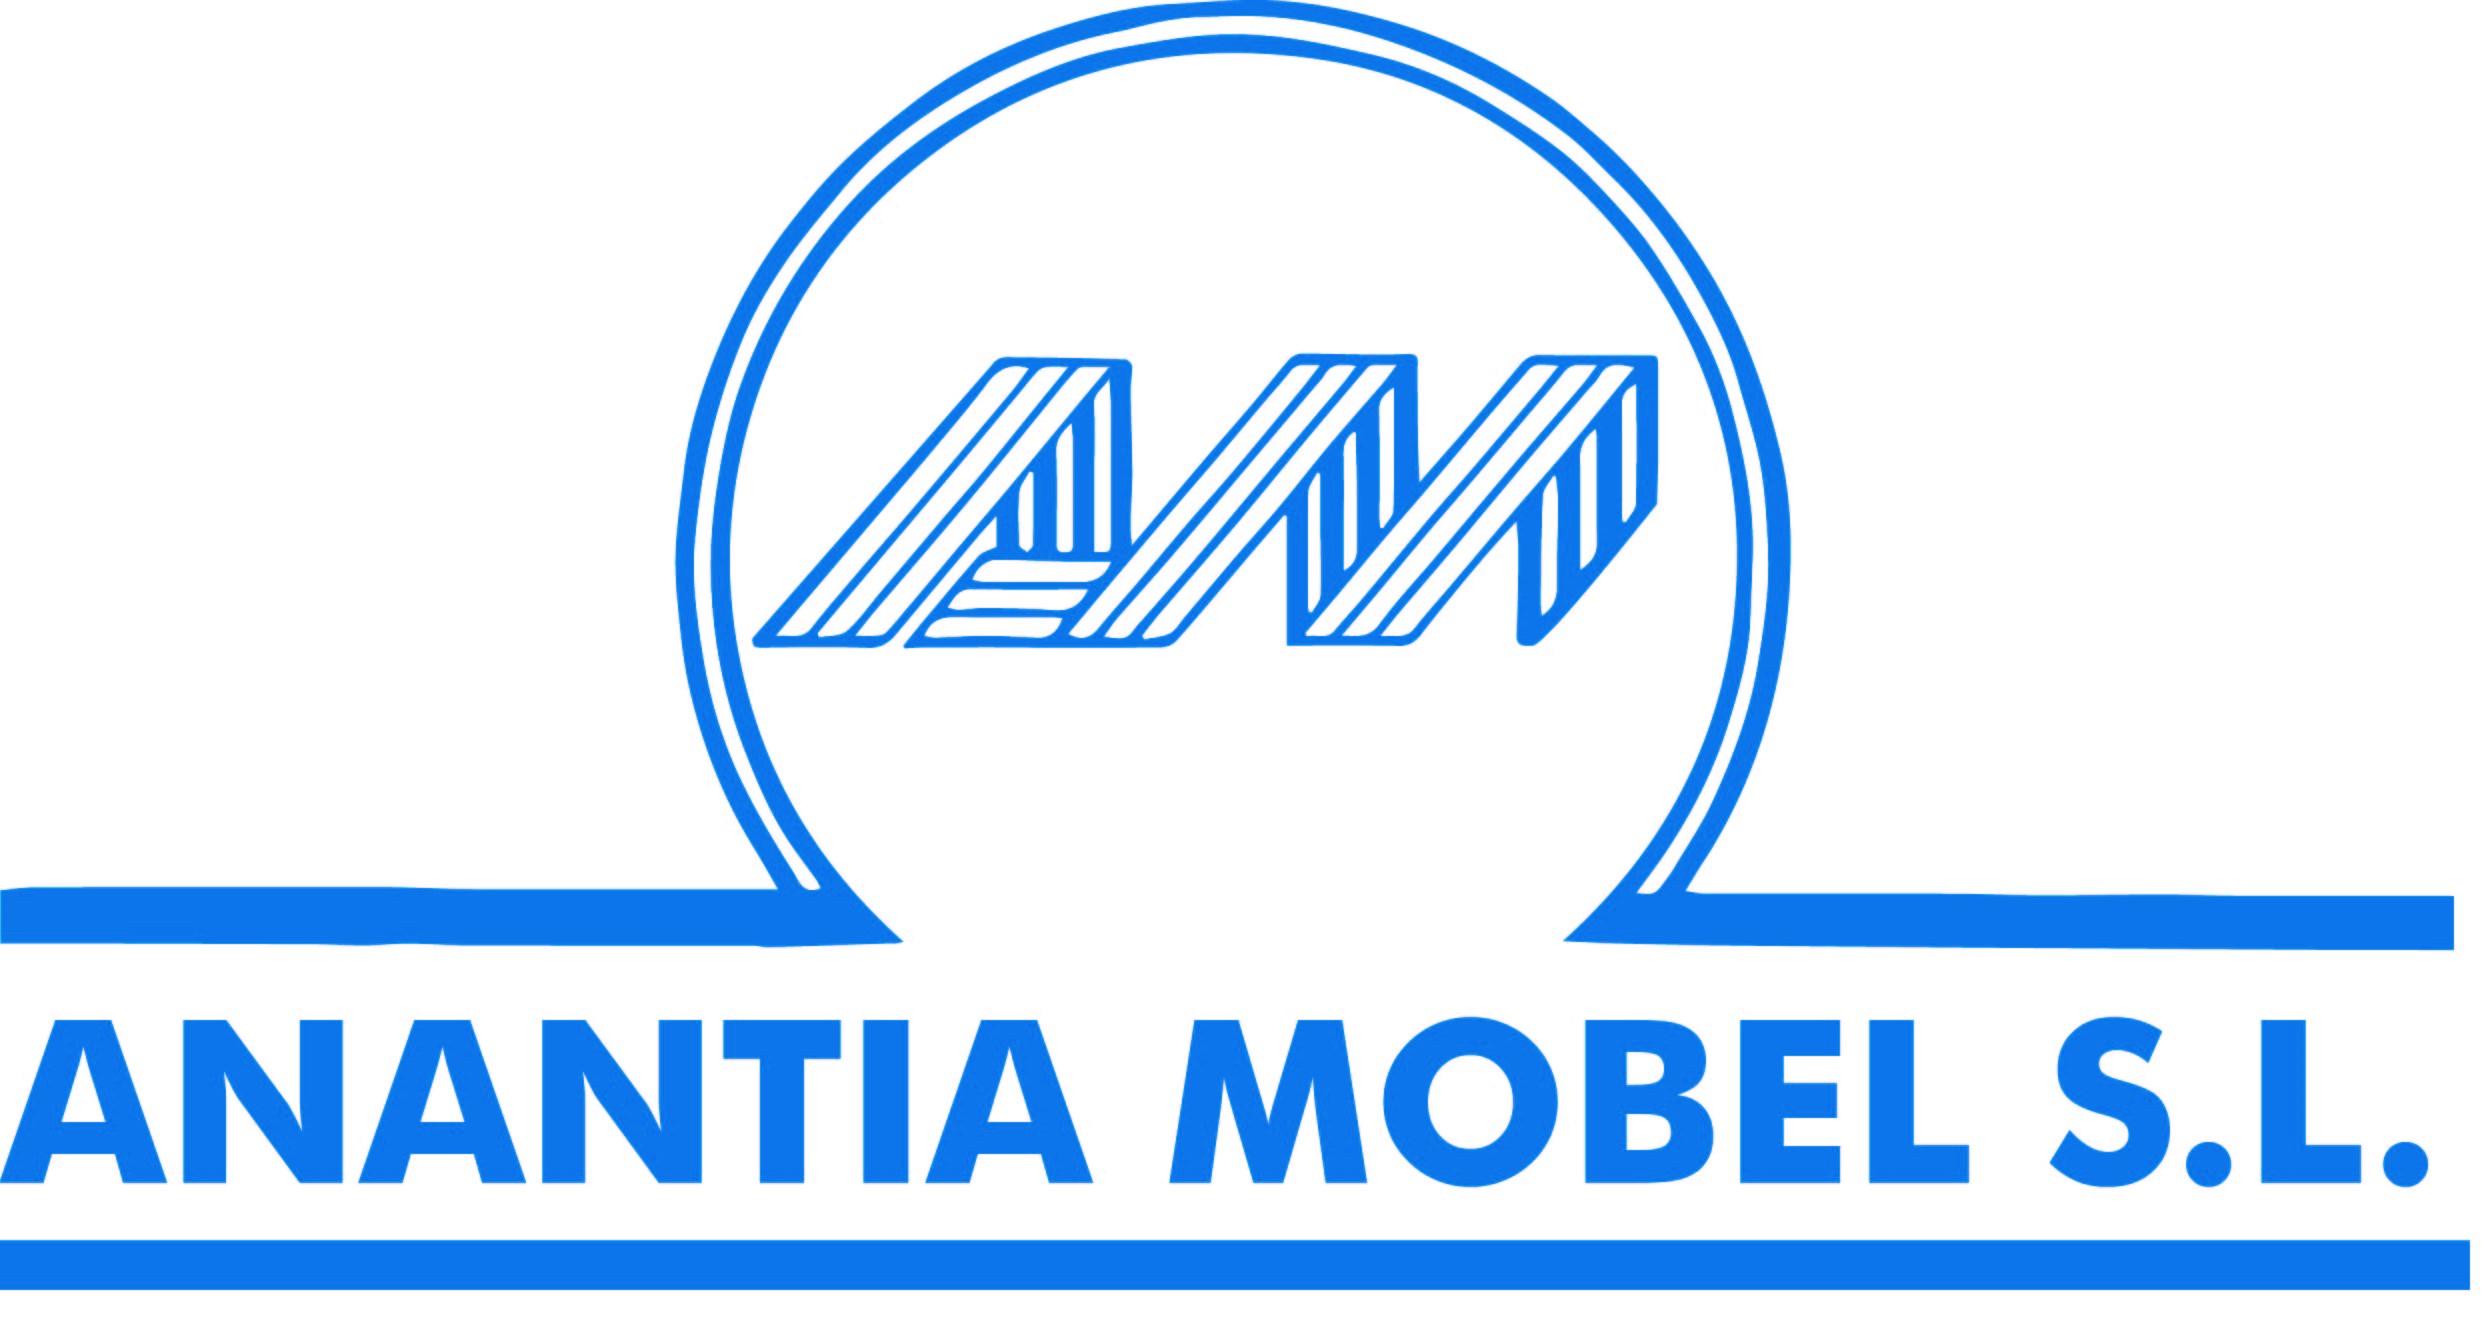 ANANTIA MOBEL